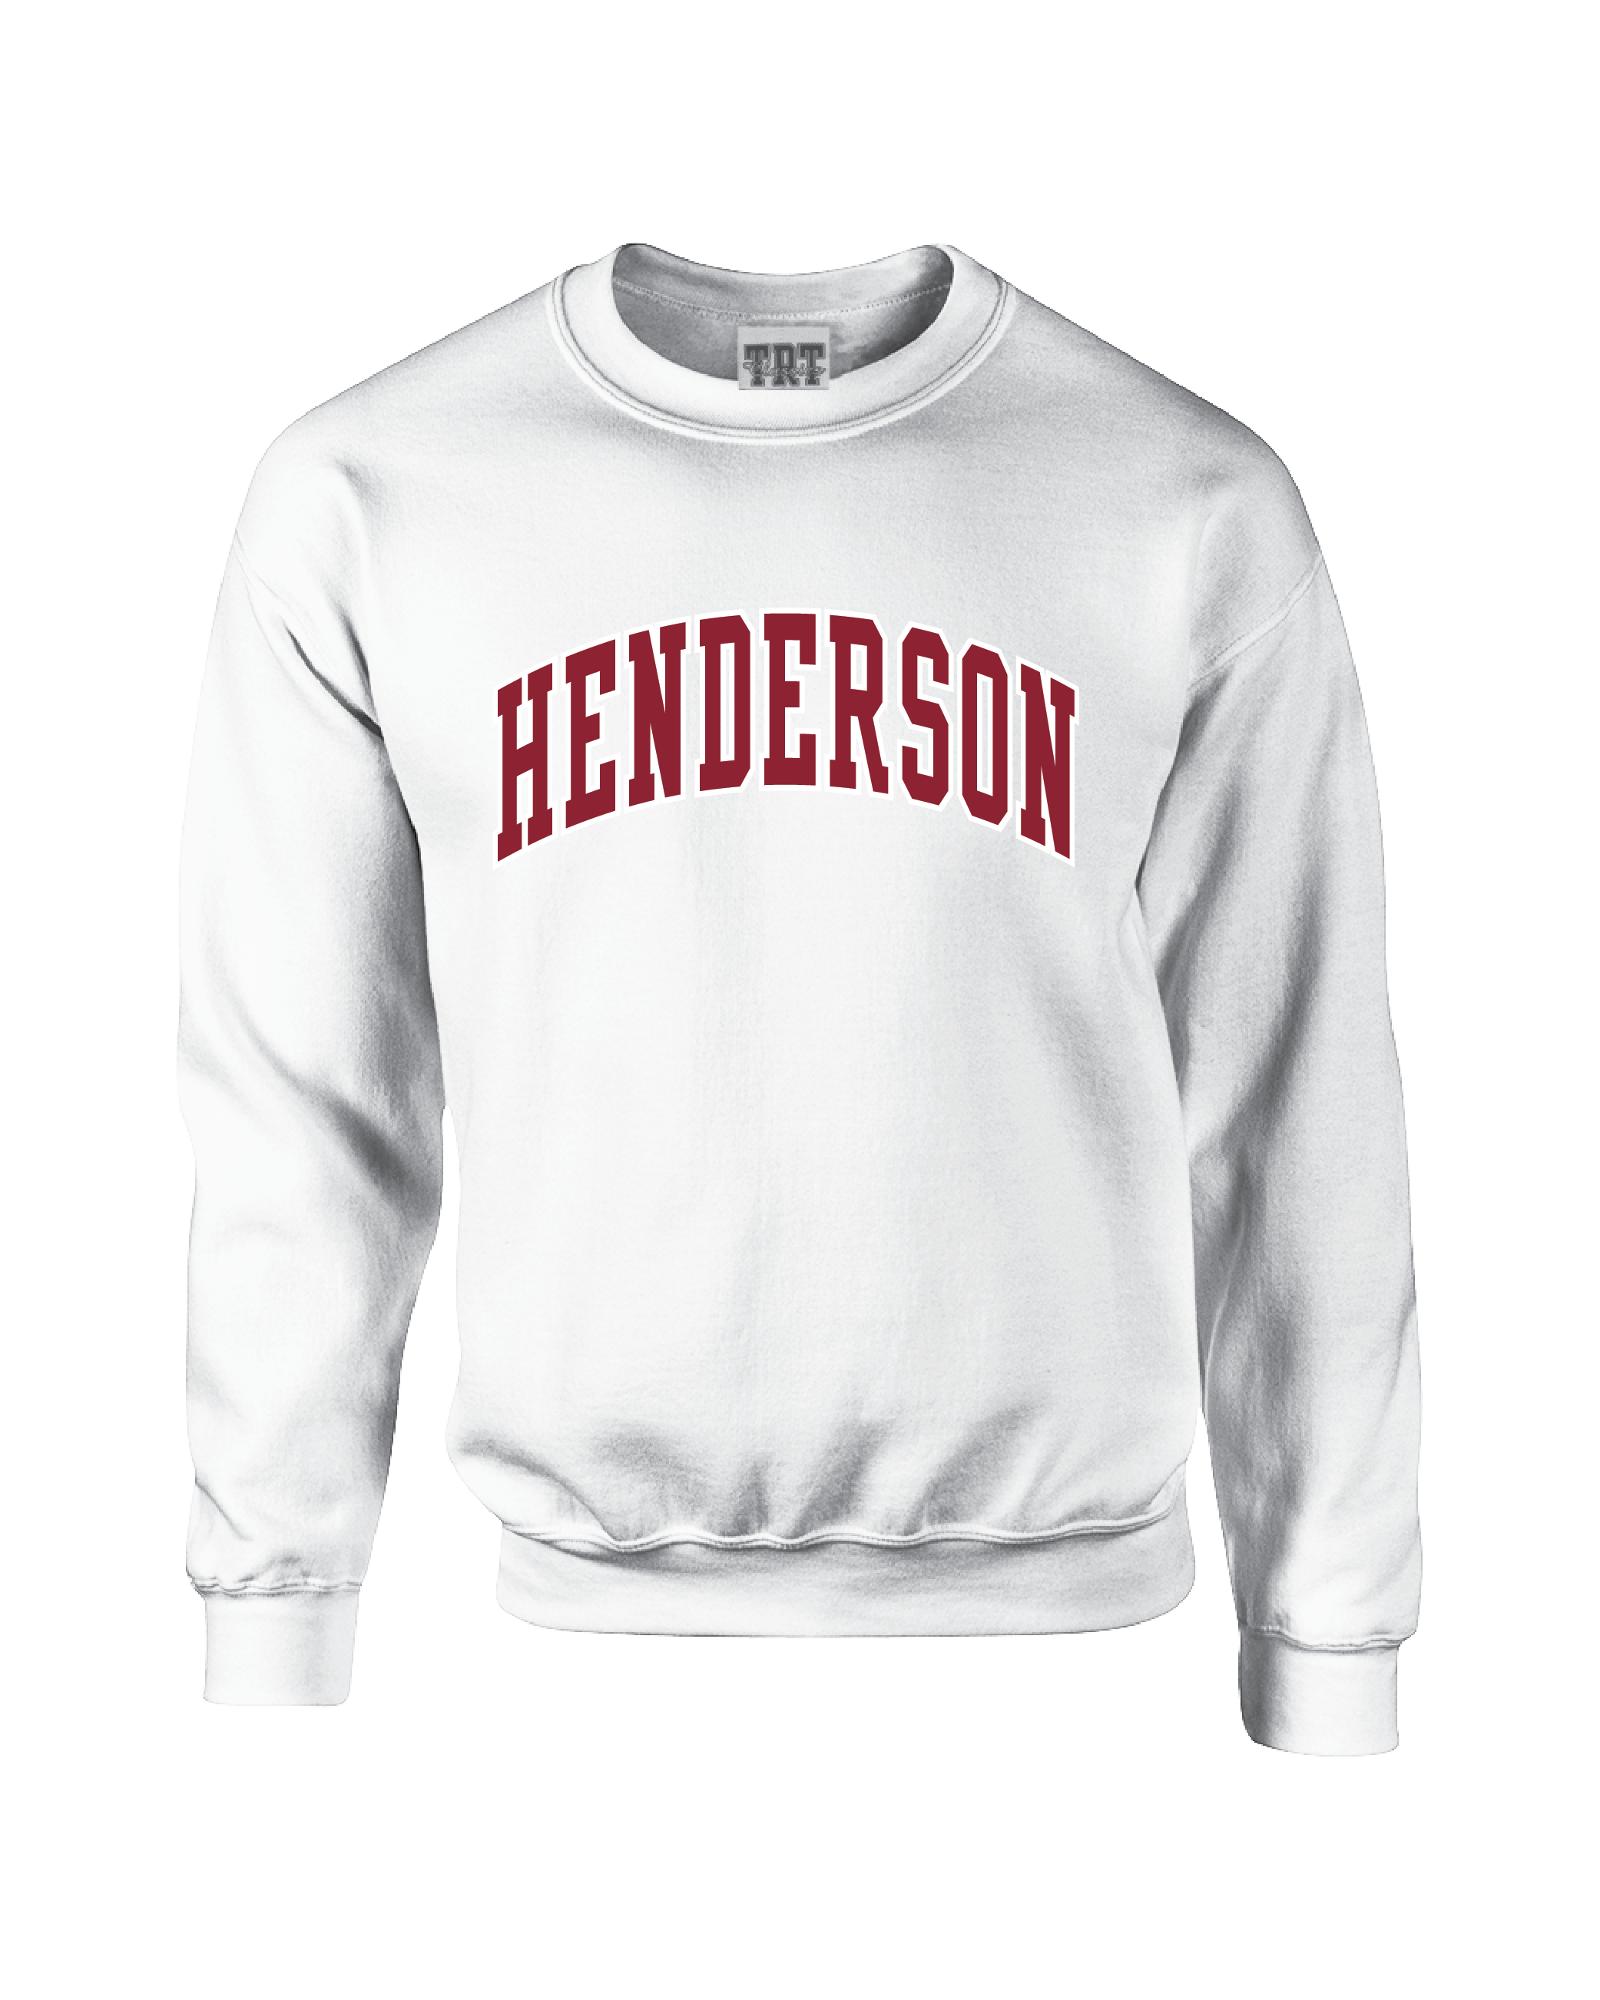 image of: Henderson Crew Sweatshirt